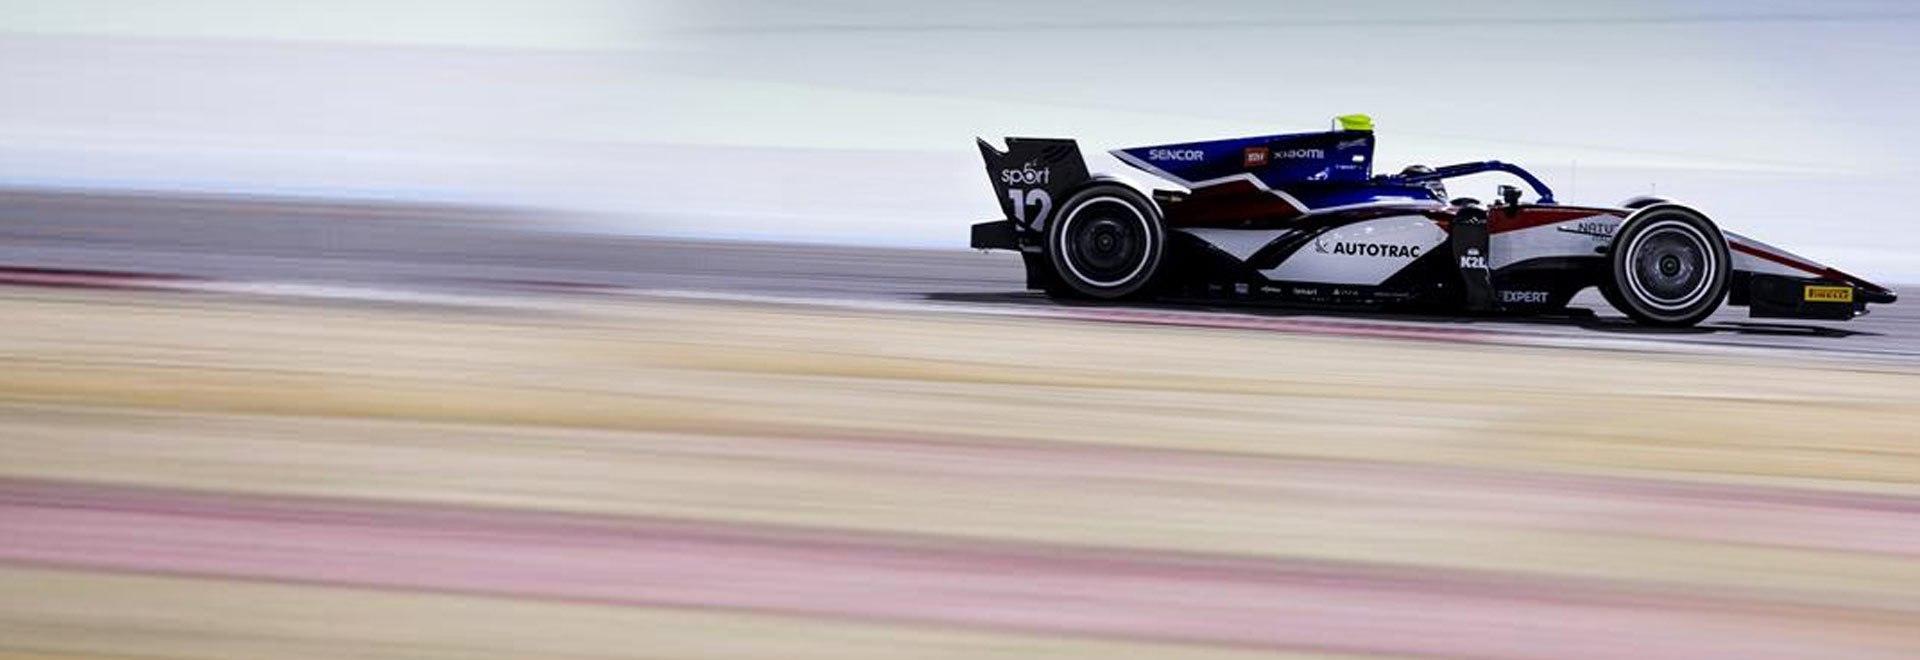 GP Stiria. Sprint Race